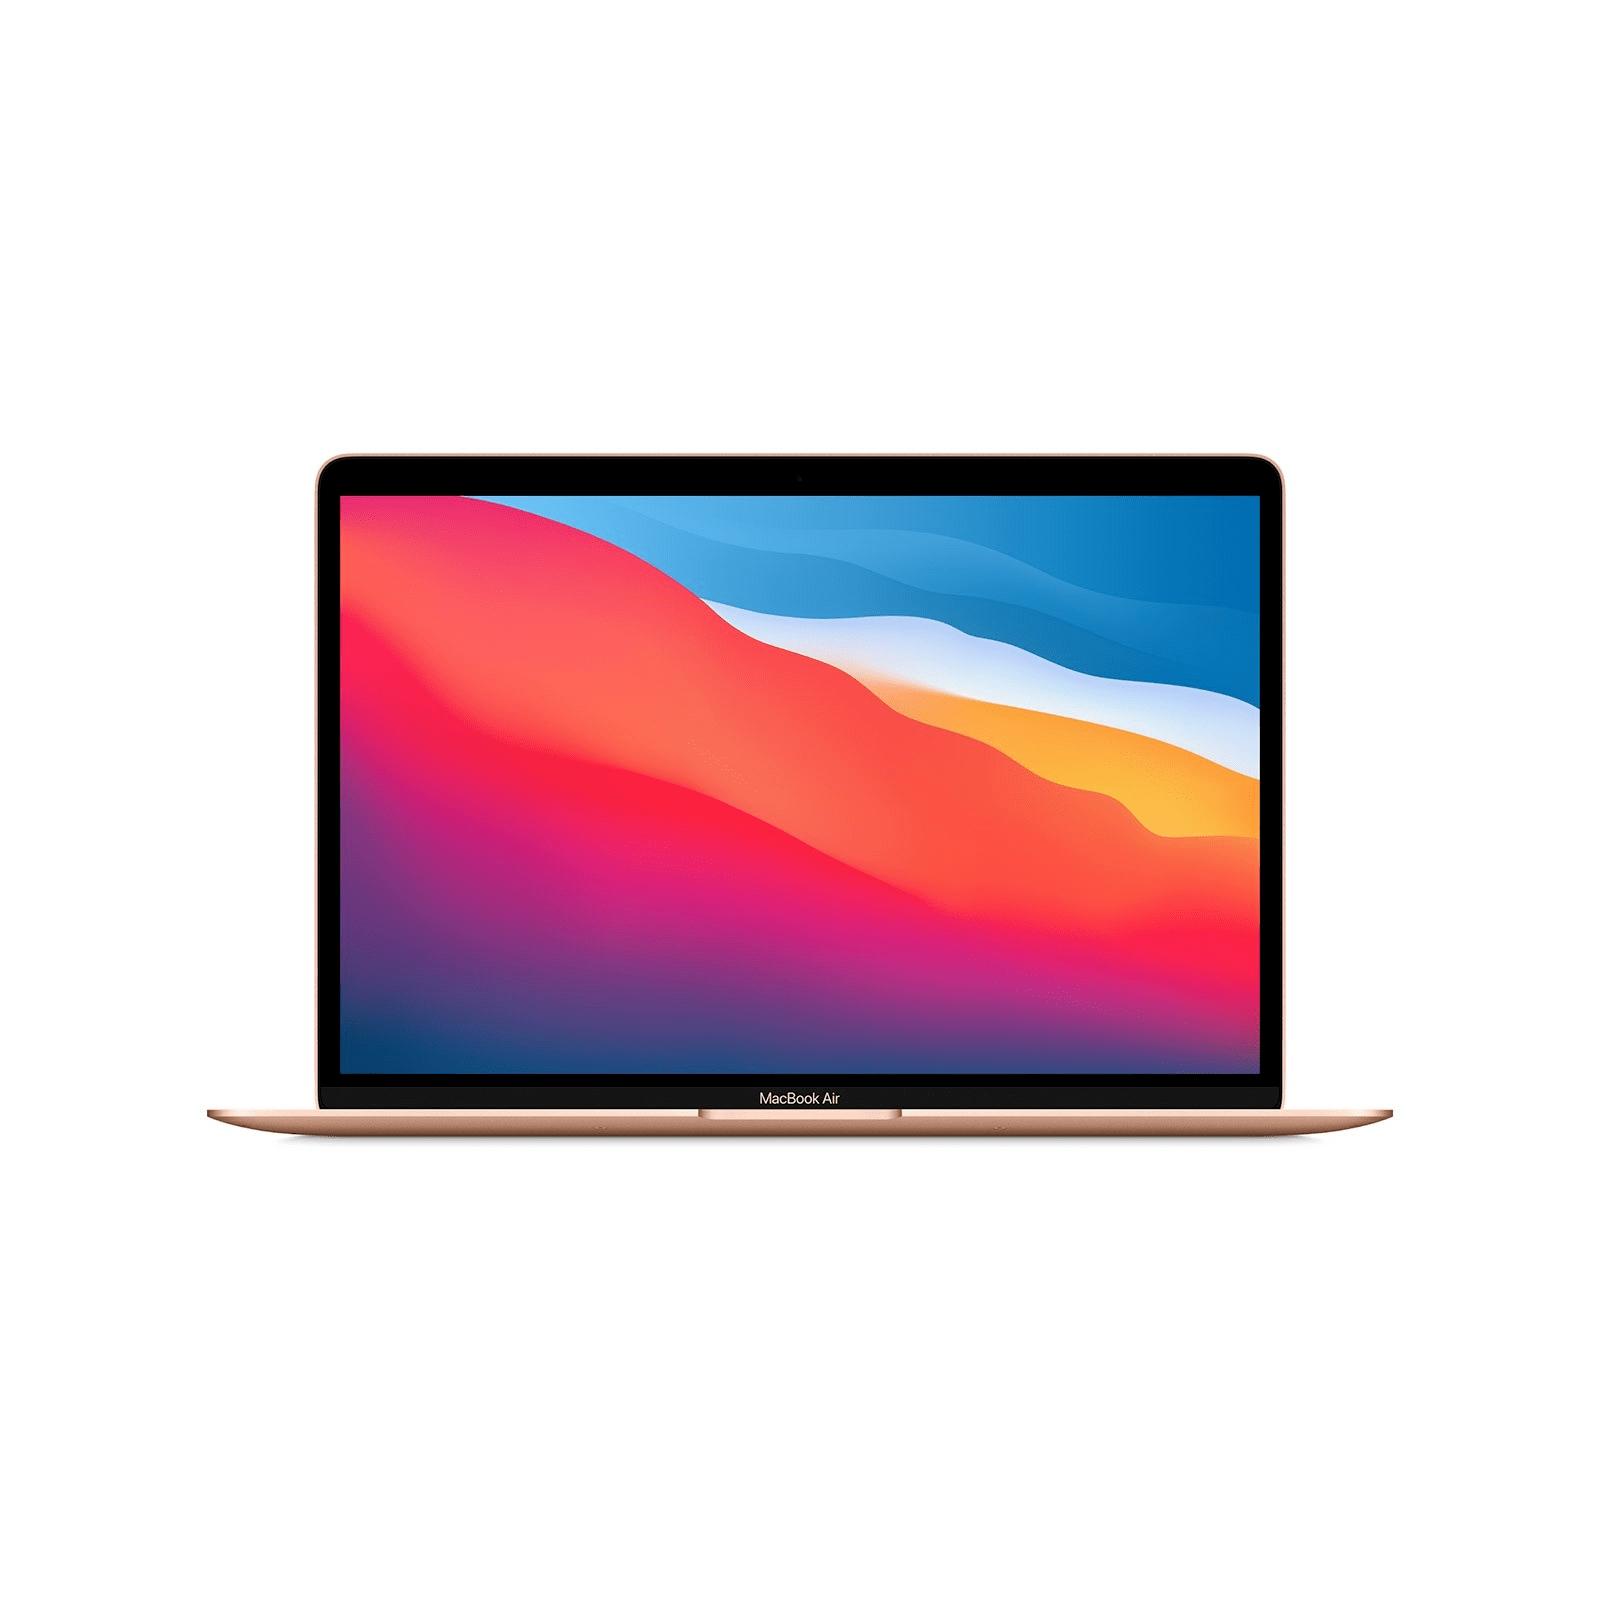 13-inch MacBook Air | Apple M1 chip | 512GB - Gold